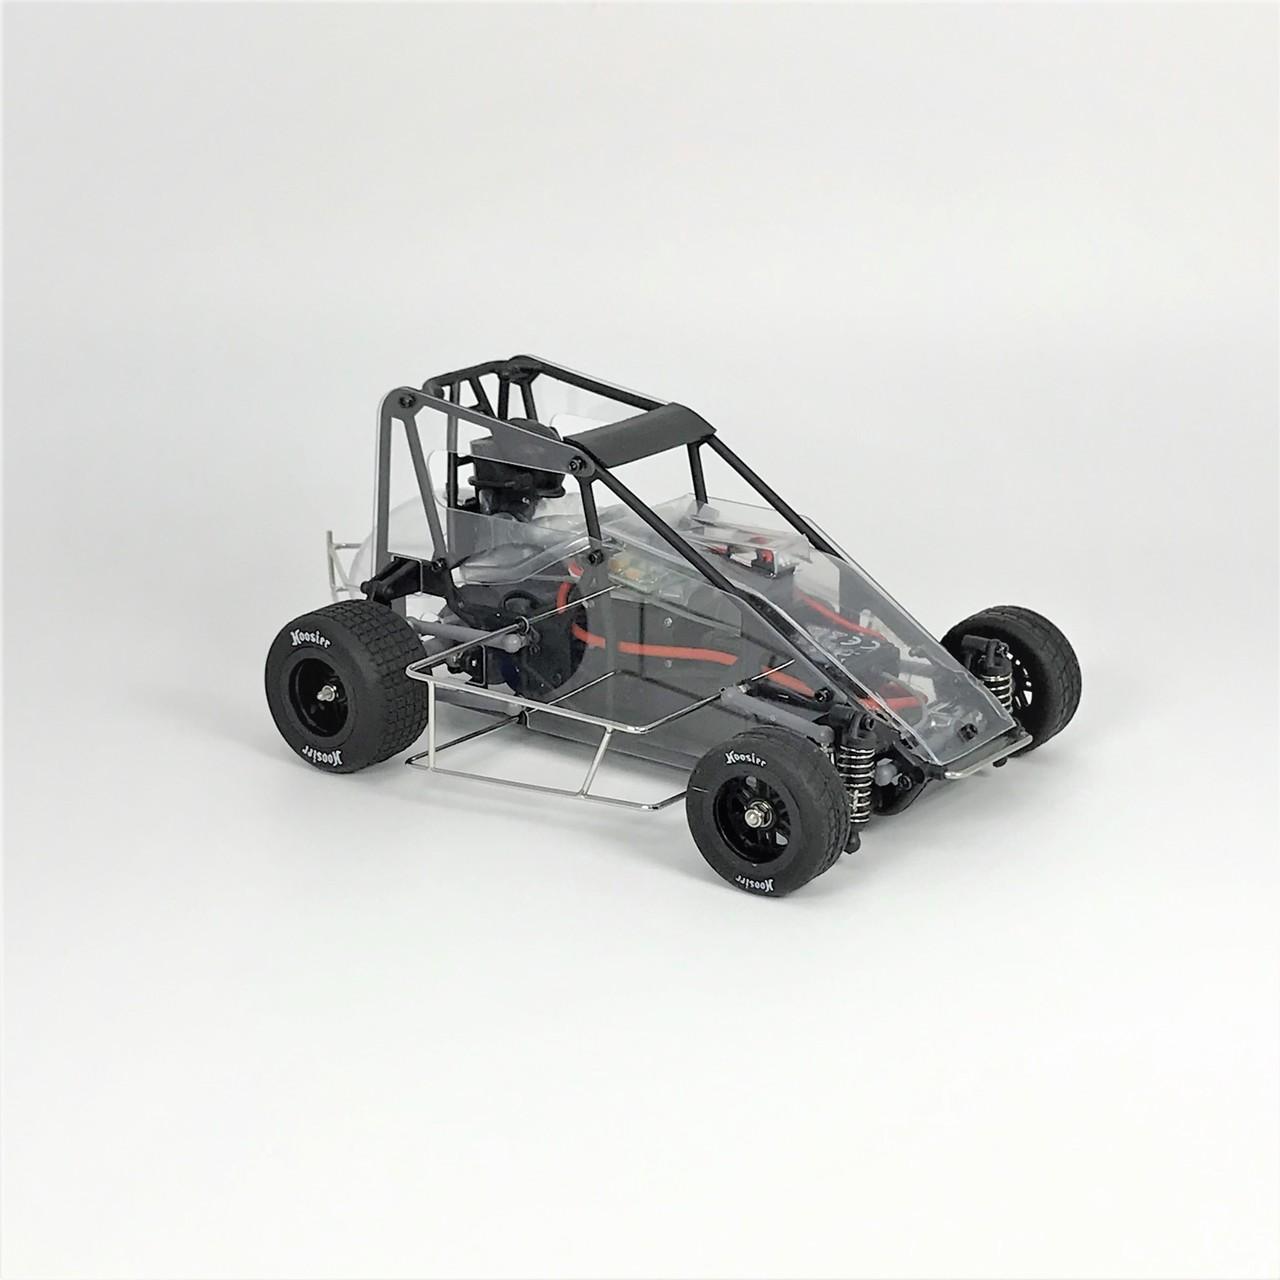 1RC Racing Midget 2 - Clear